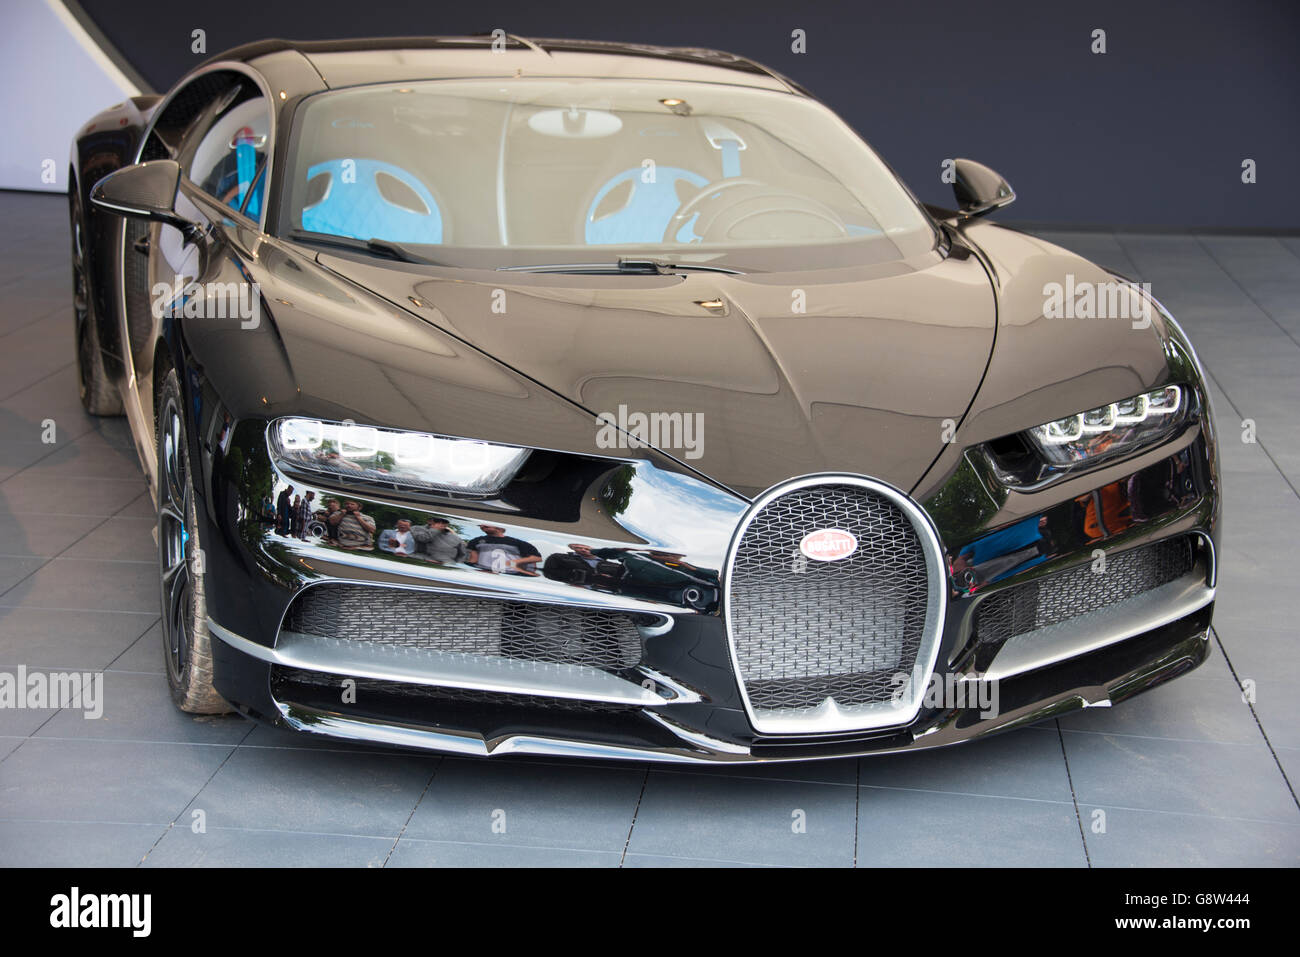 Bugatti Chiron 1500 BHP at Goodwood - Stock Image